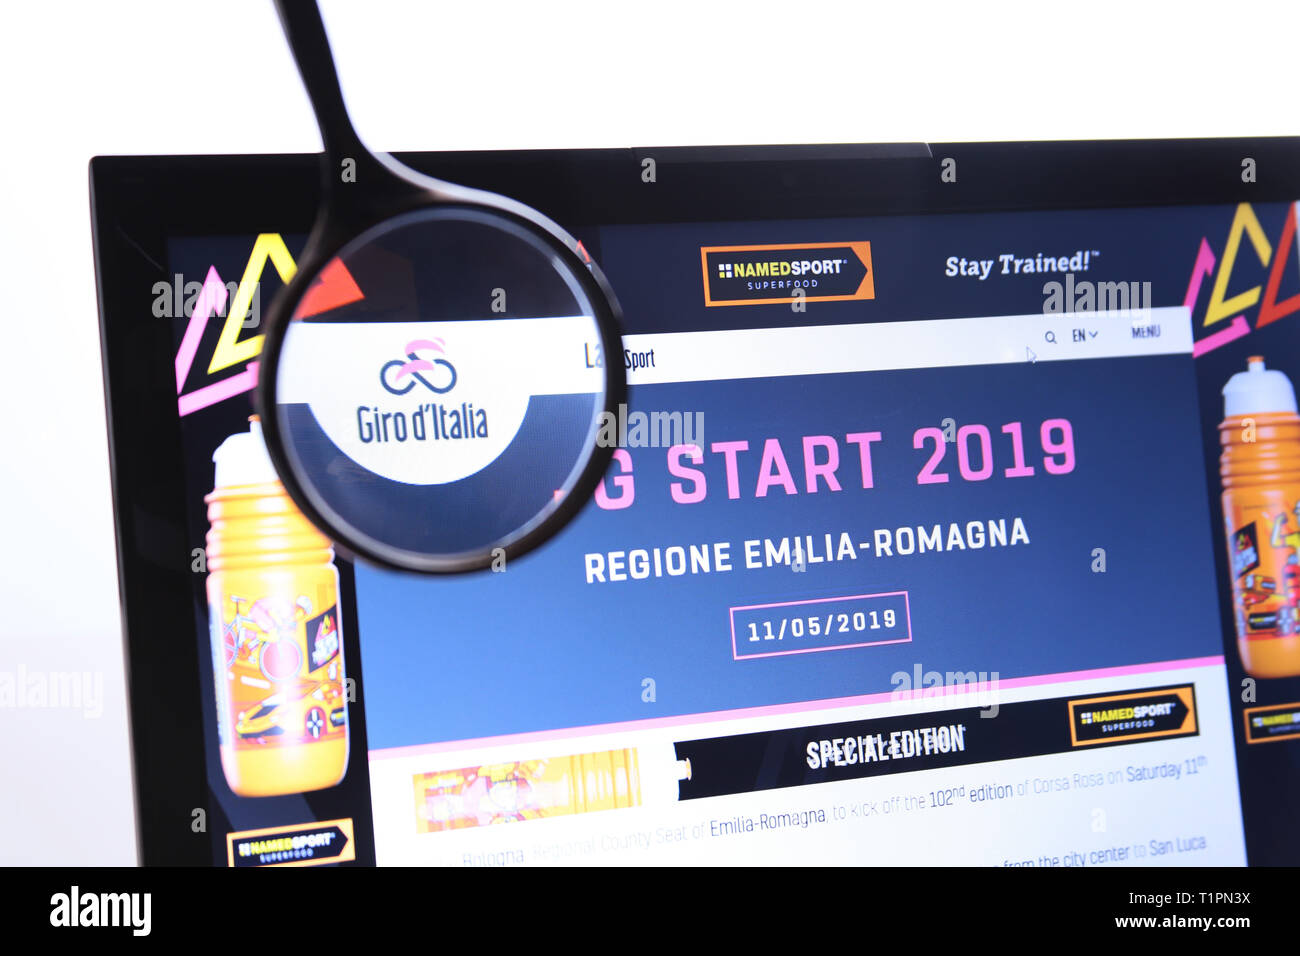 Bolonia, Italia - 26 de marzo de 2019: Sitio Web Editorial ilustrativa del Giro d'Italia logotipo visible en pantalla. Imagen De Stock